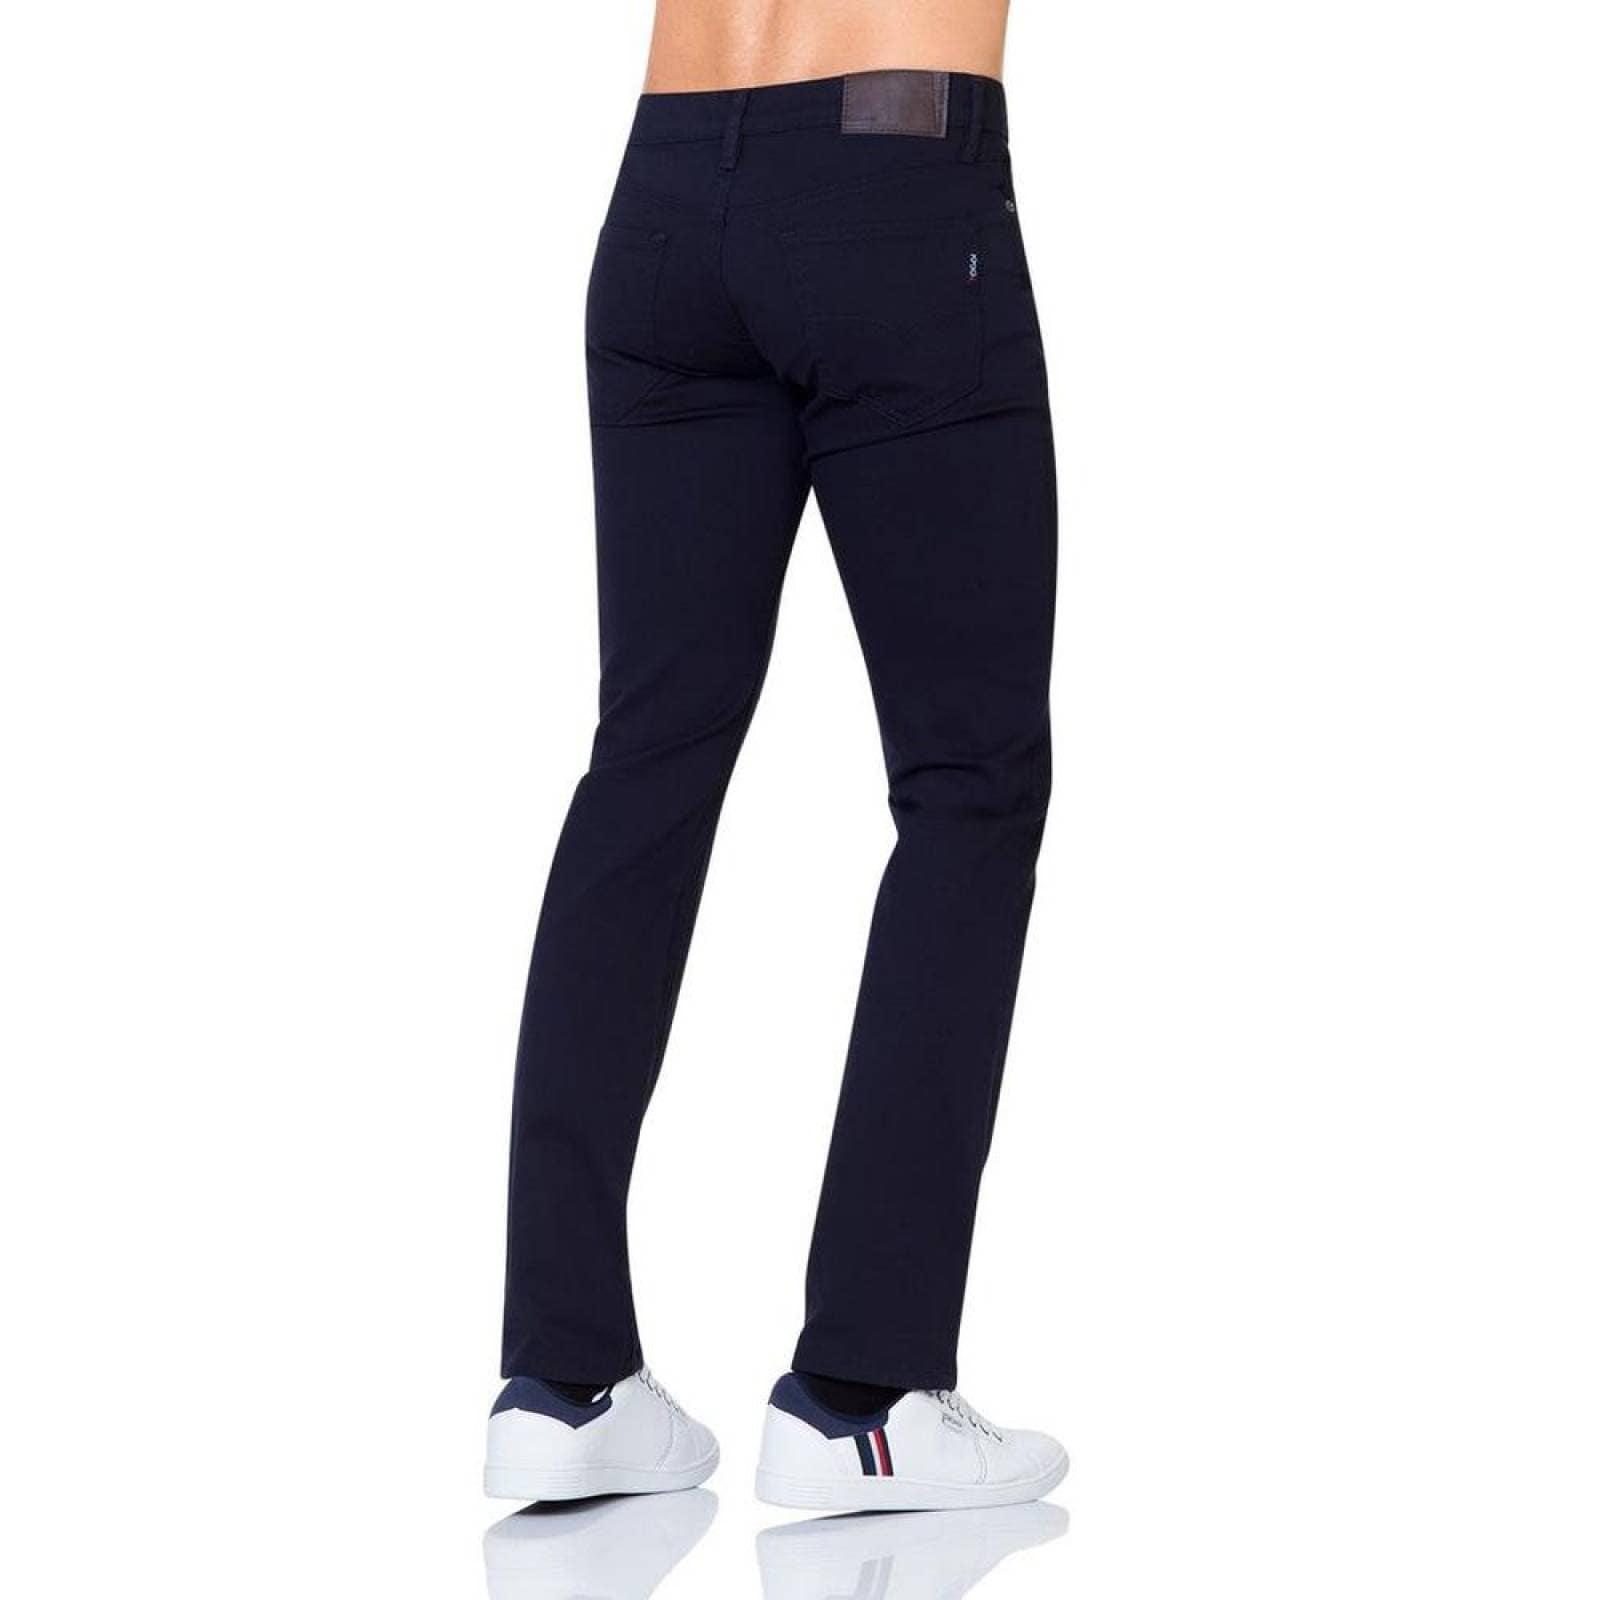 Pantalon Casual Hombre Oggi Movin 59102136 Gabardina Stretch